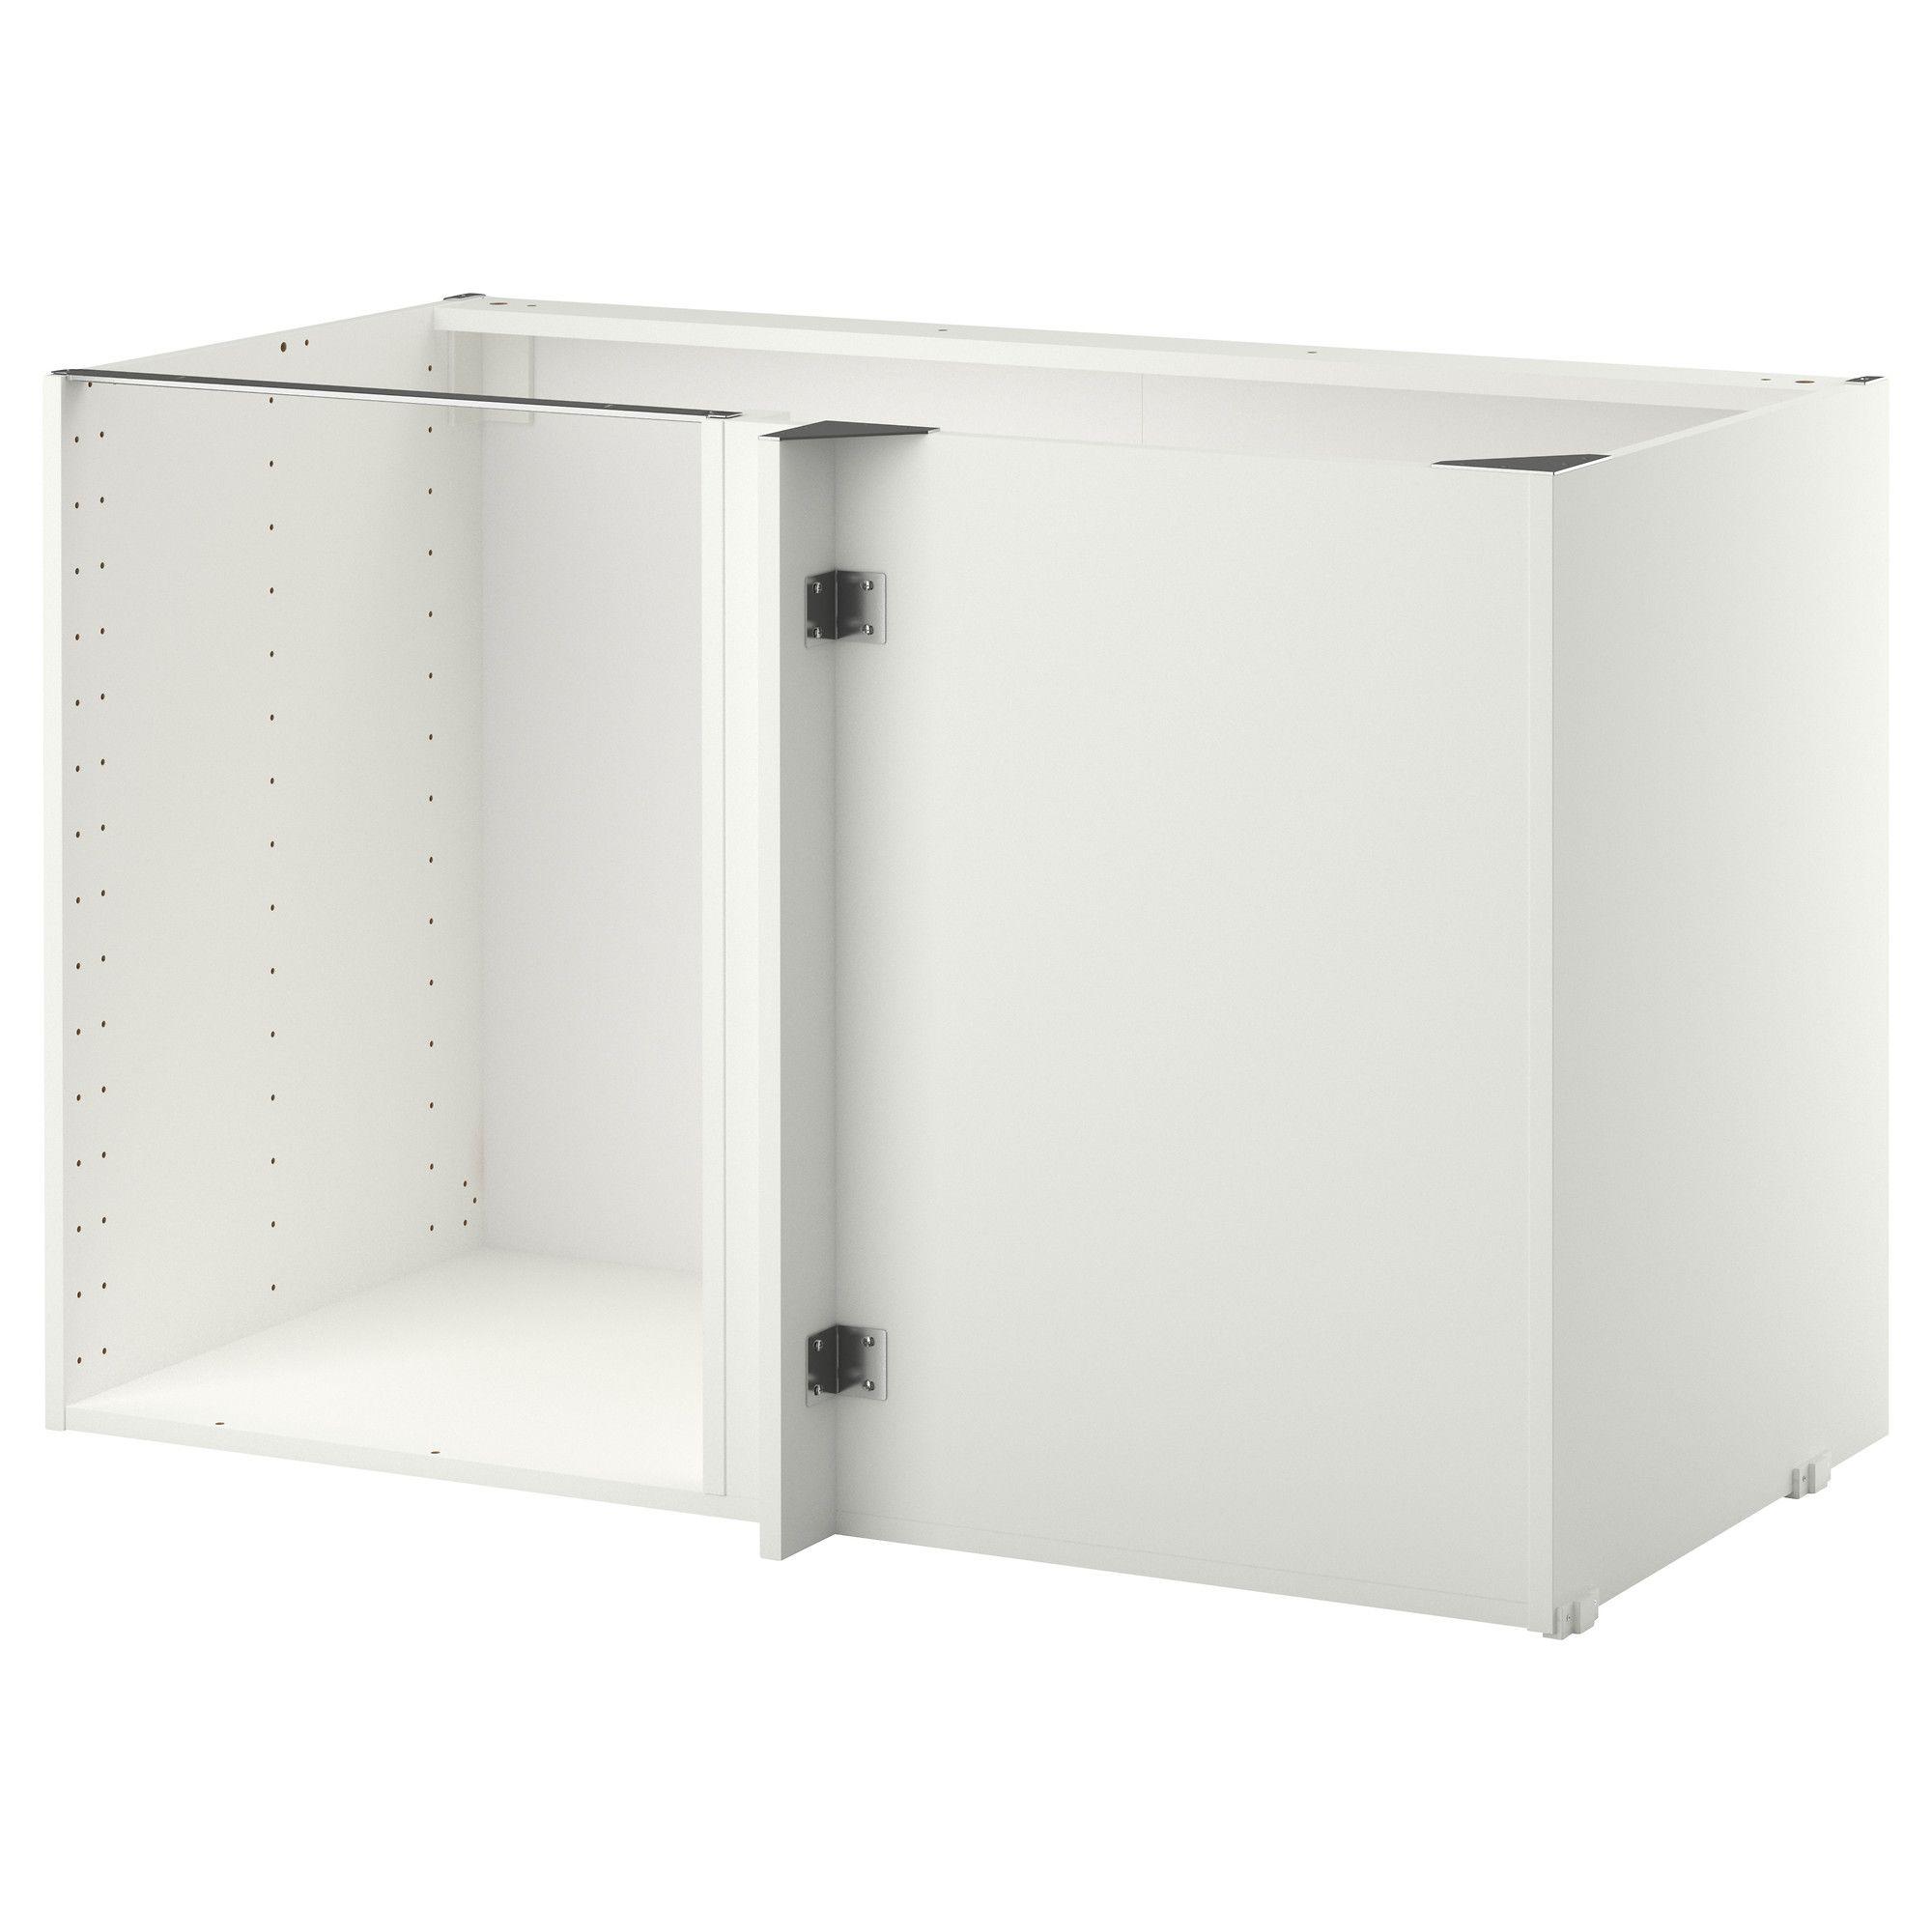 Metod Structure Element Bas D Angle Blanc 128x68x80 Cm Ikea Ikea Element Bas Blanc